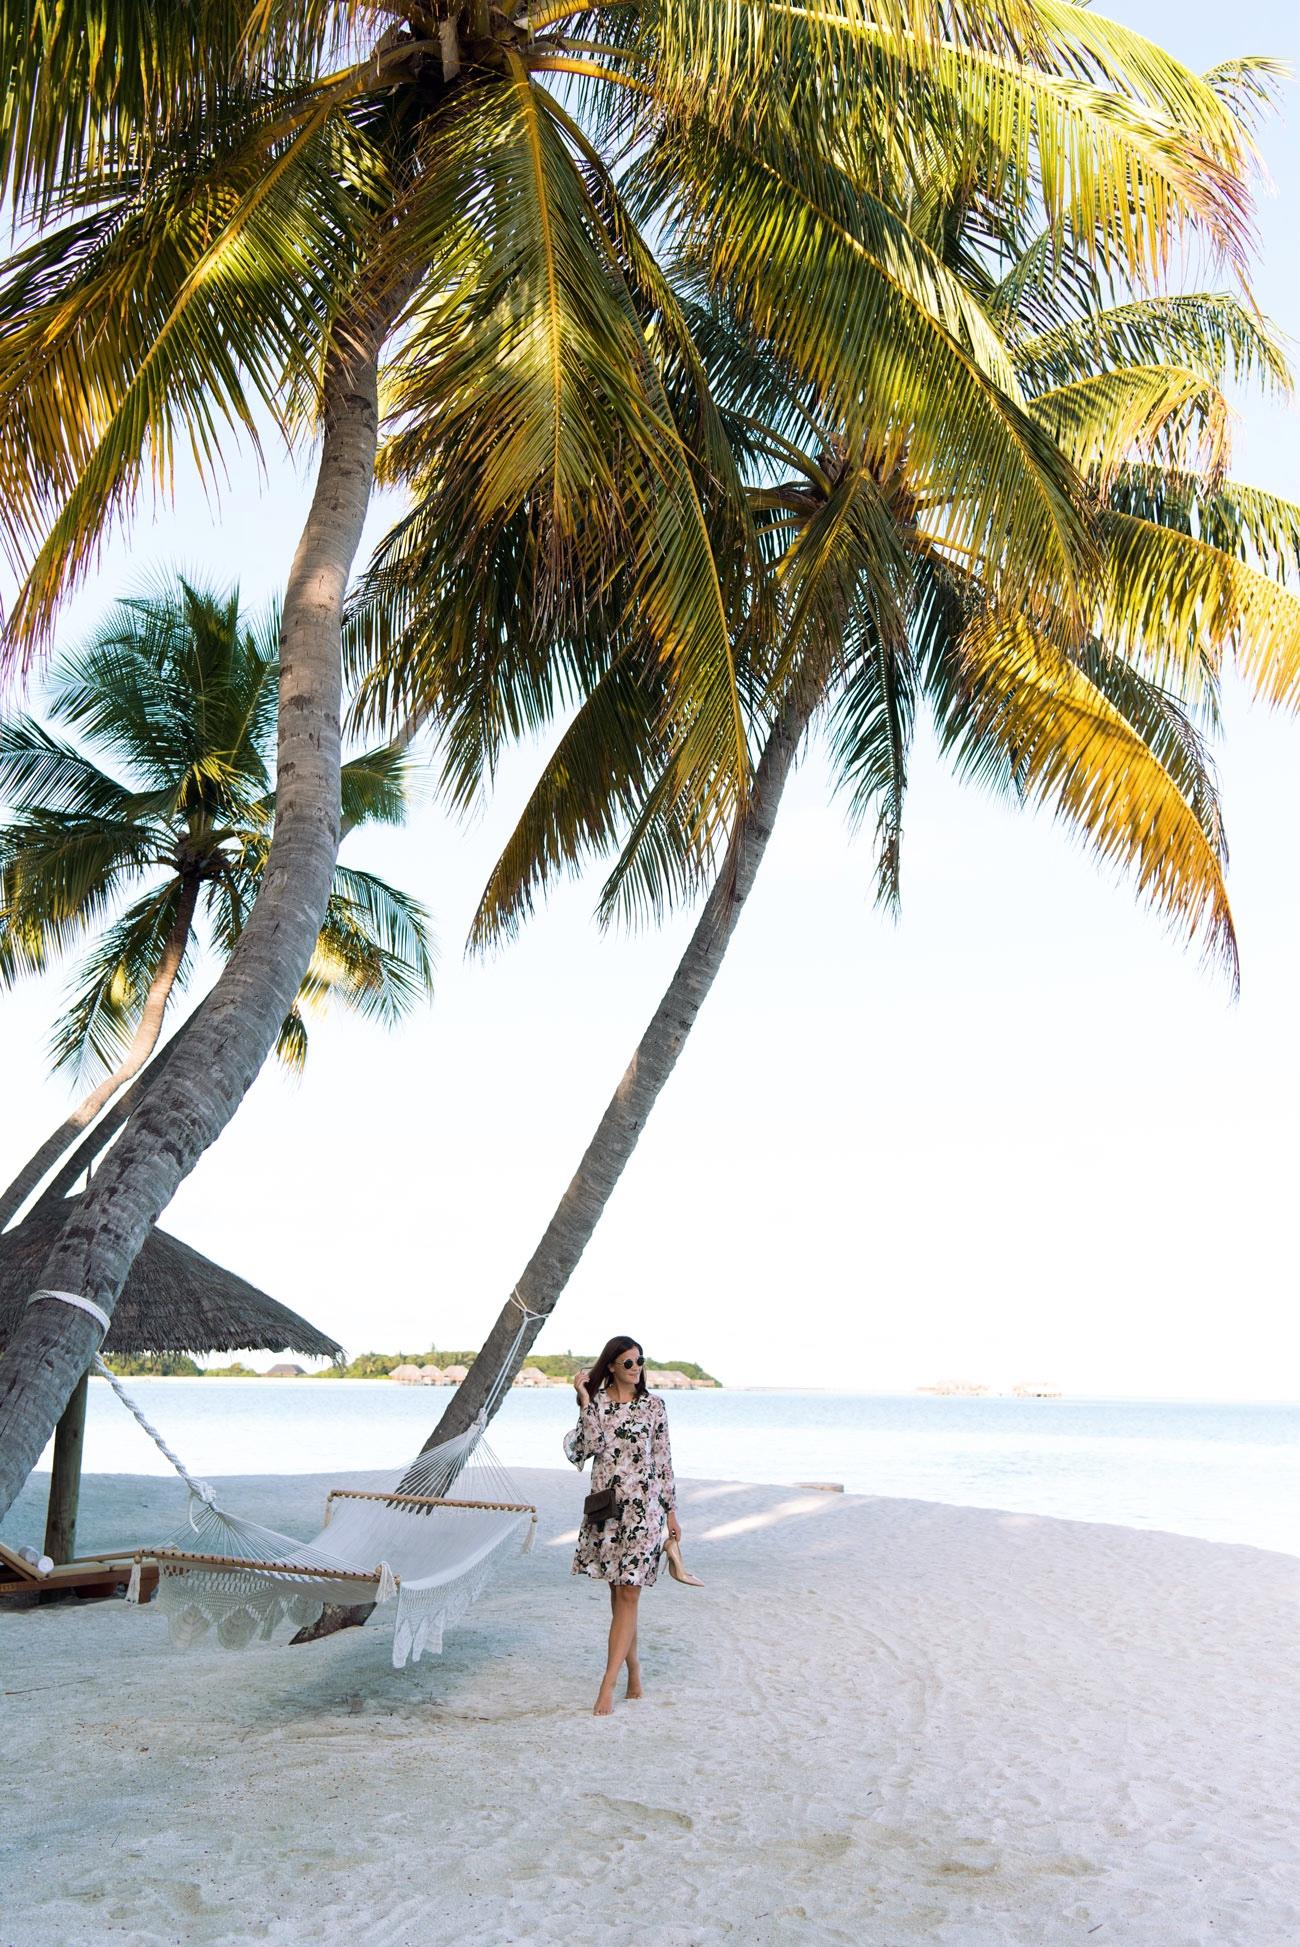 urlaub-auf-den-malediven-conrad-hilton-hotel-fashiioncarpet